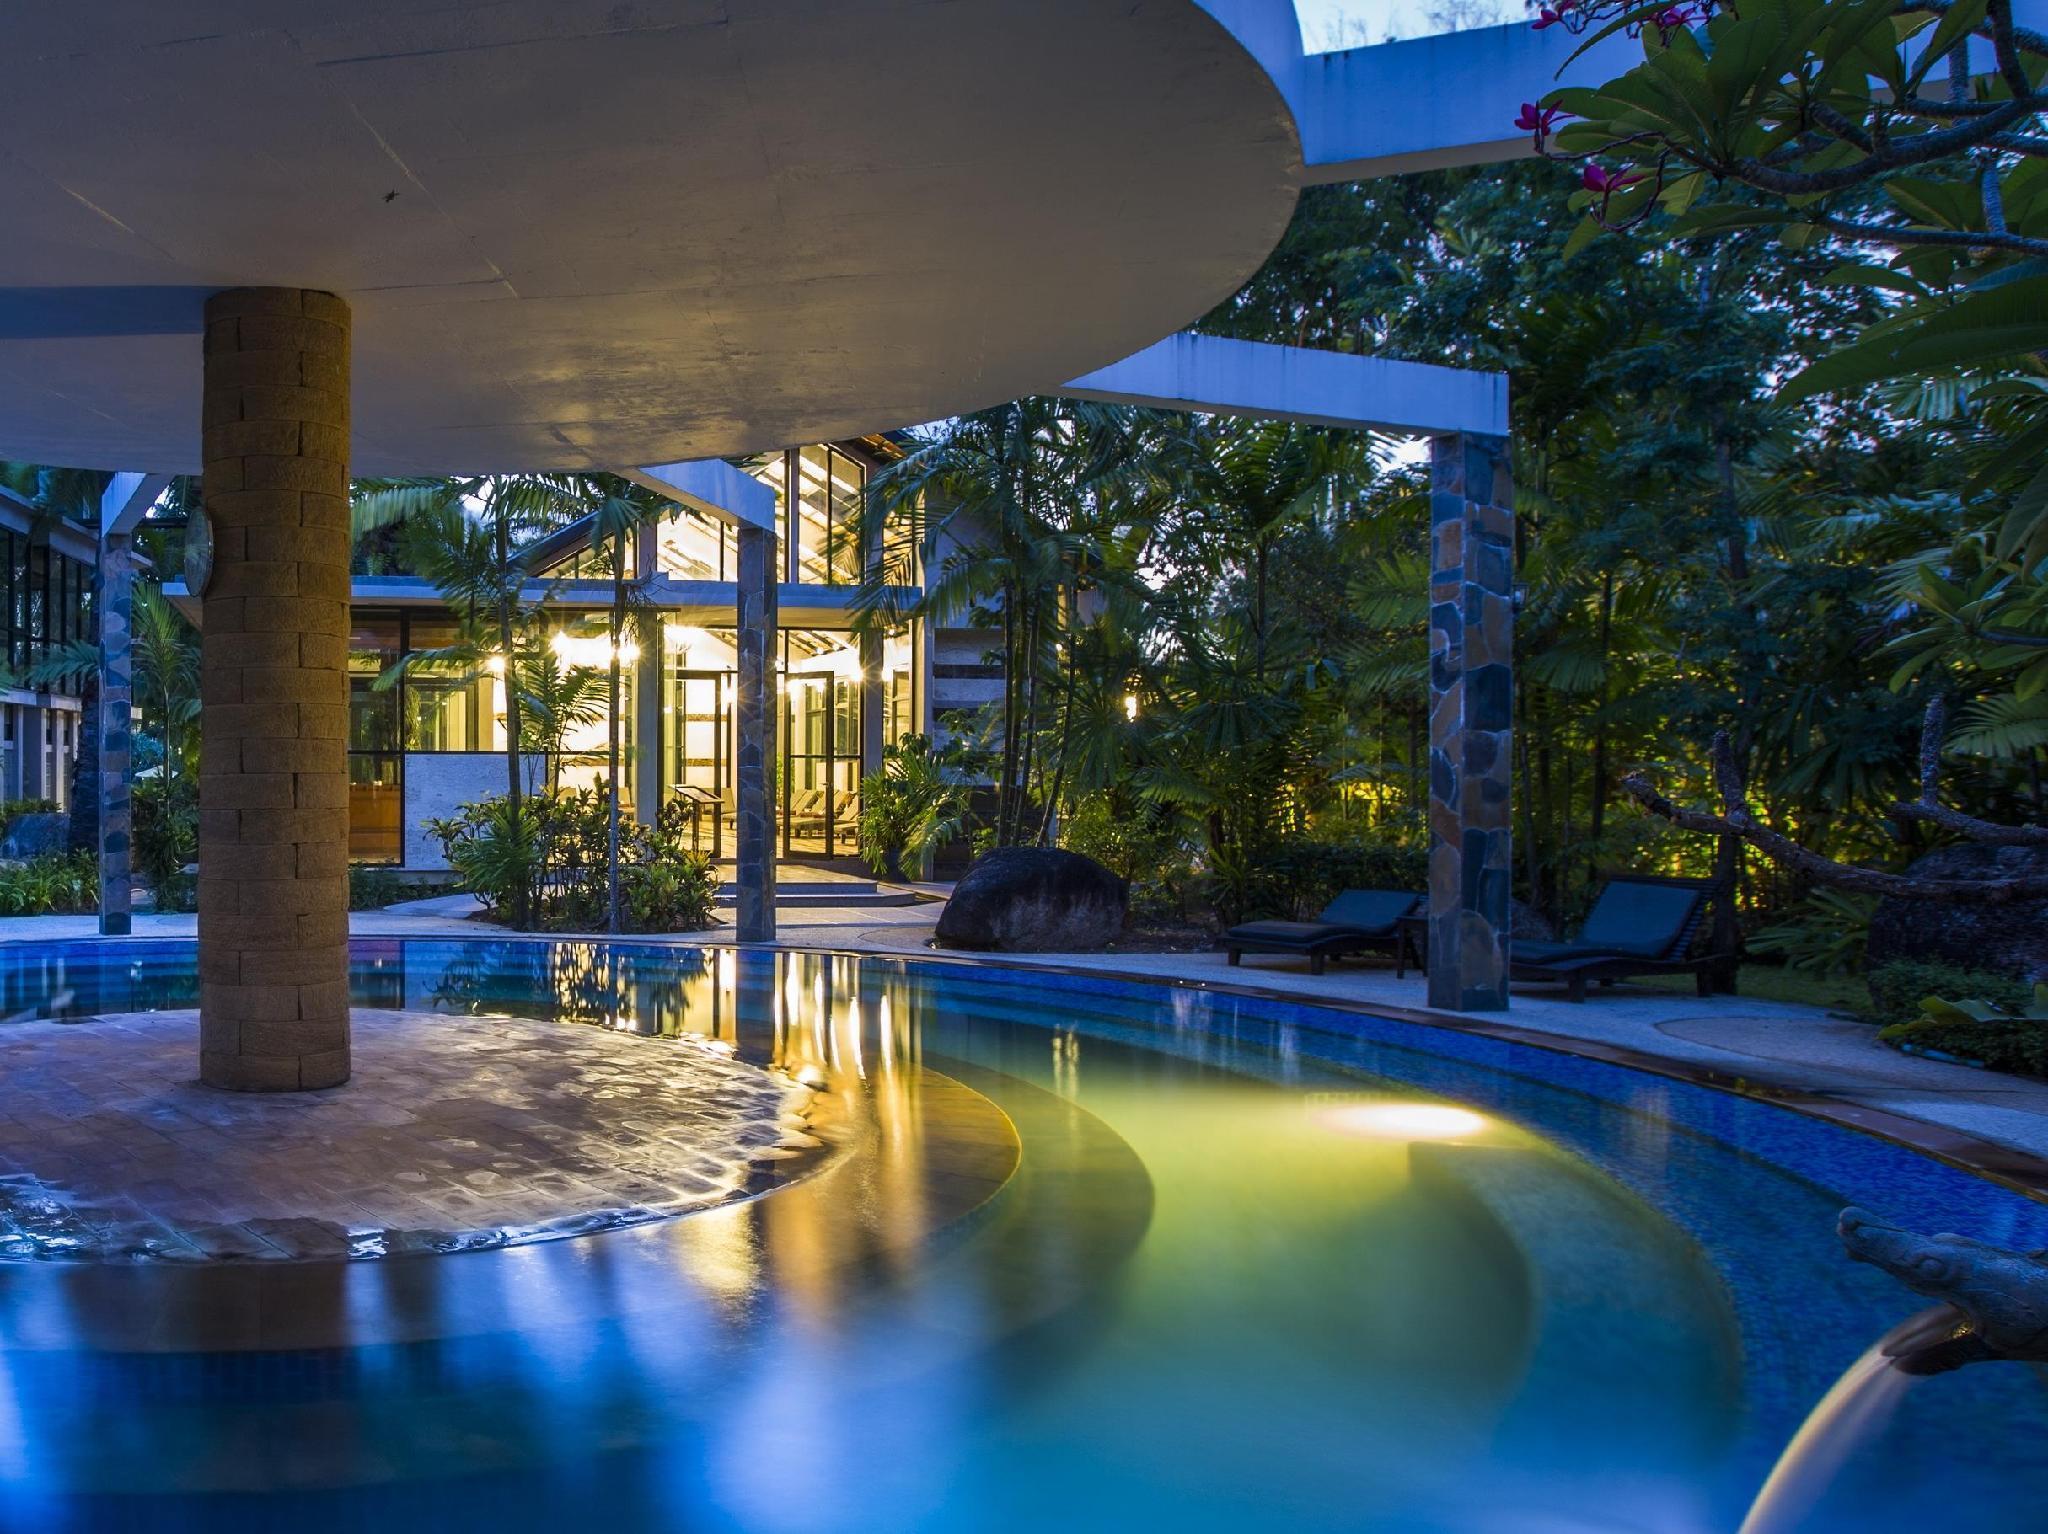 The Hotspring Beach Resort & Spa เดอะ ฮอท สปริง บีช รีสอร์ท แอนด์ สปา